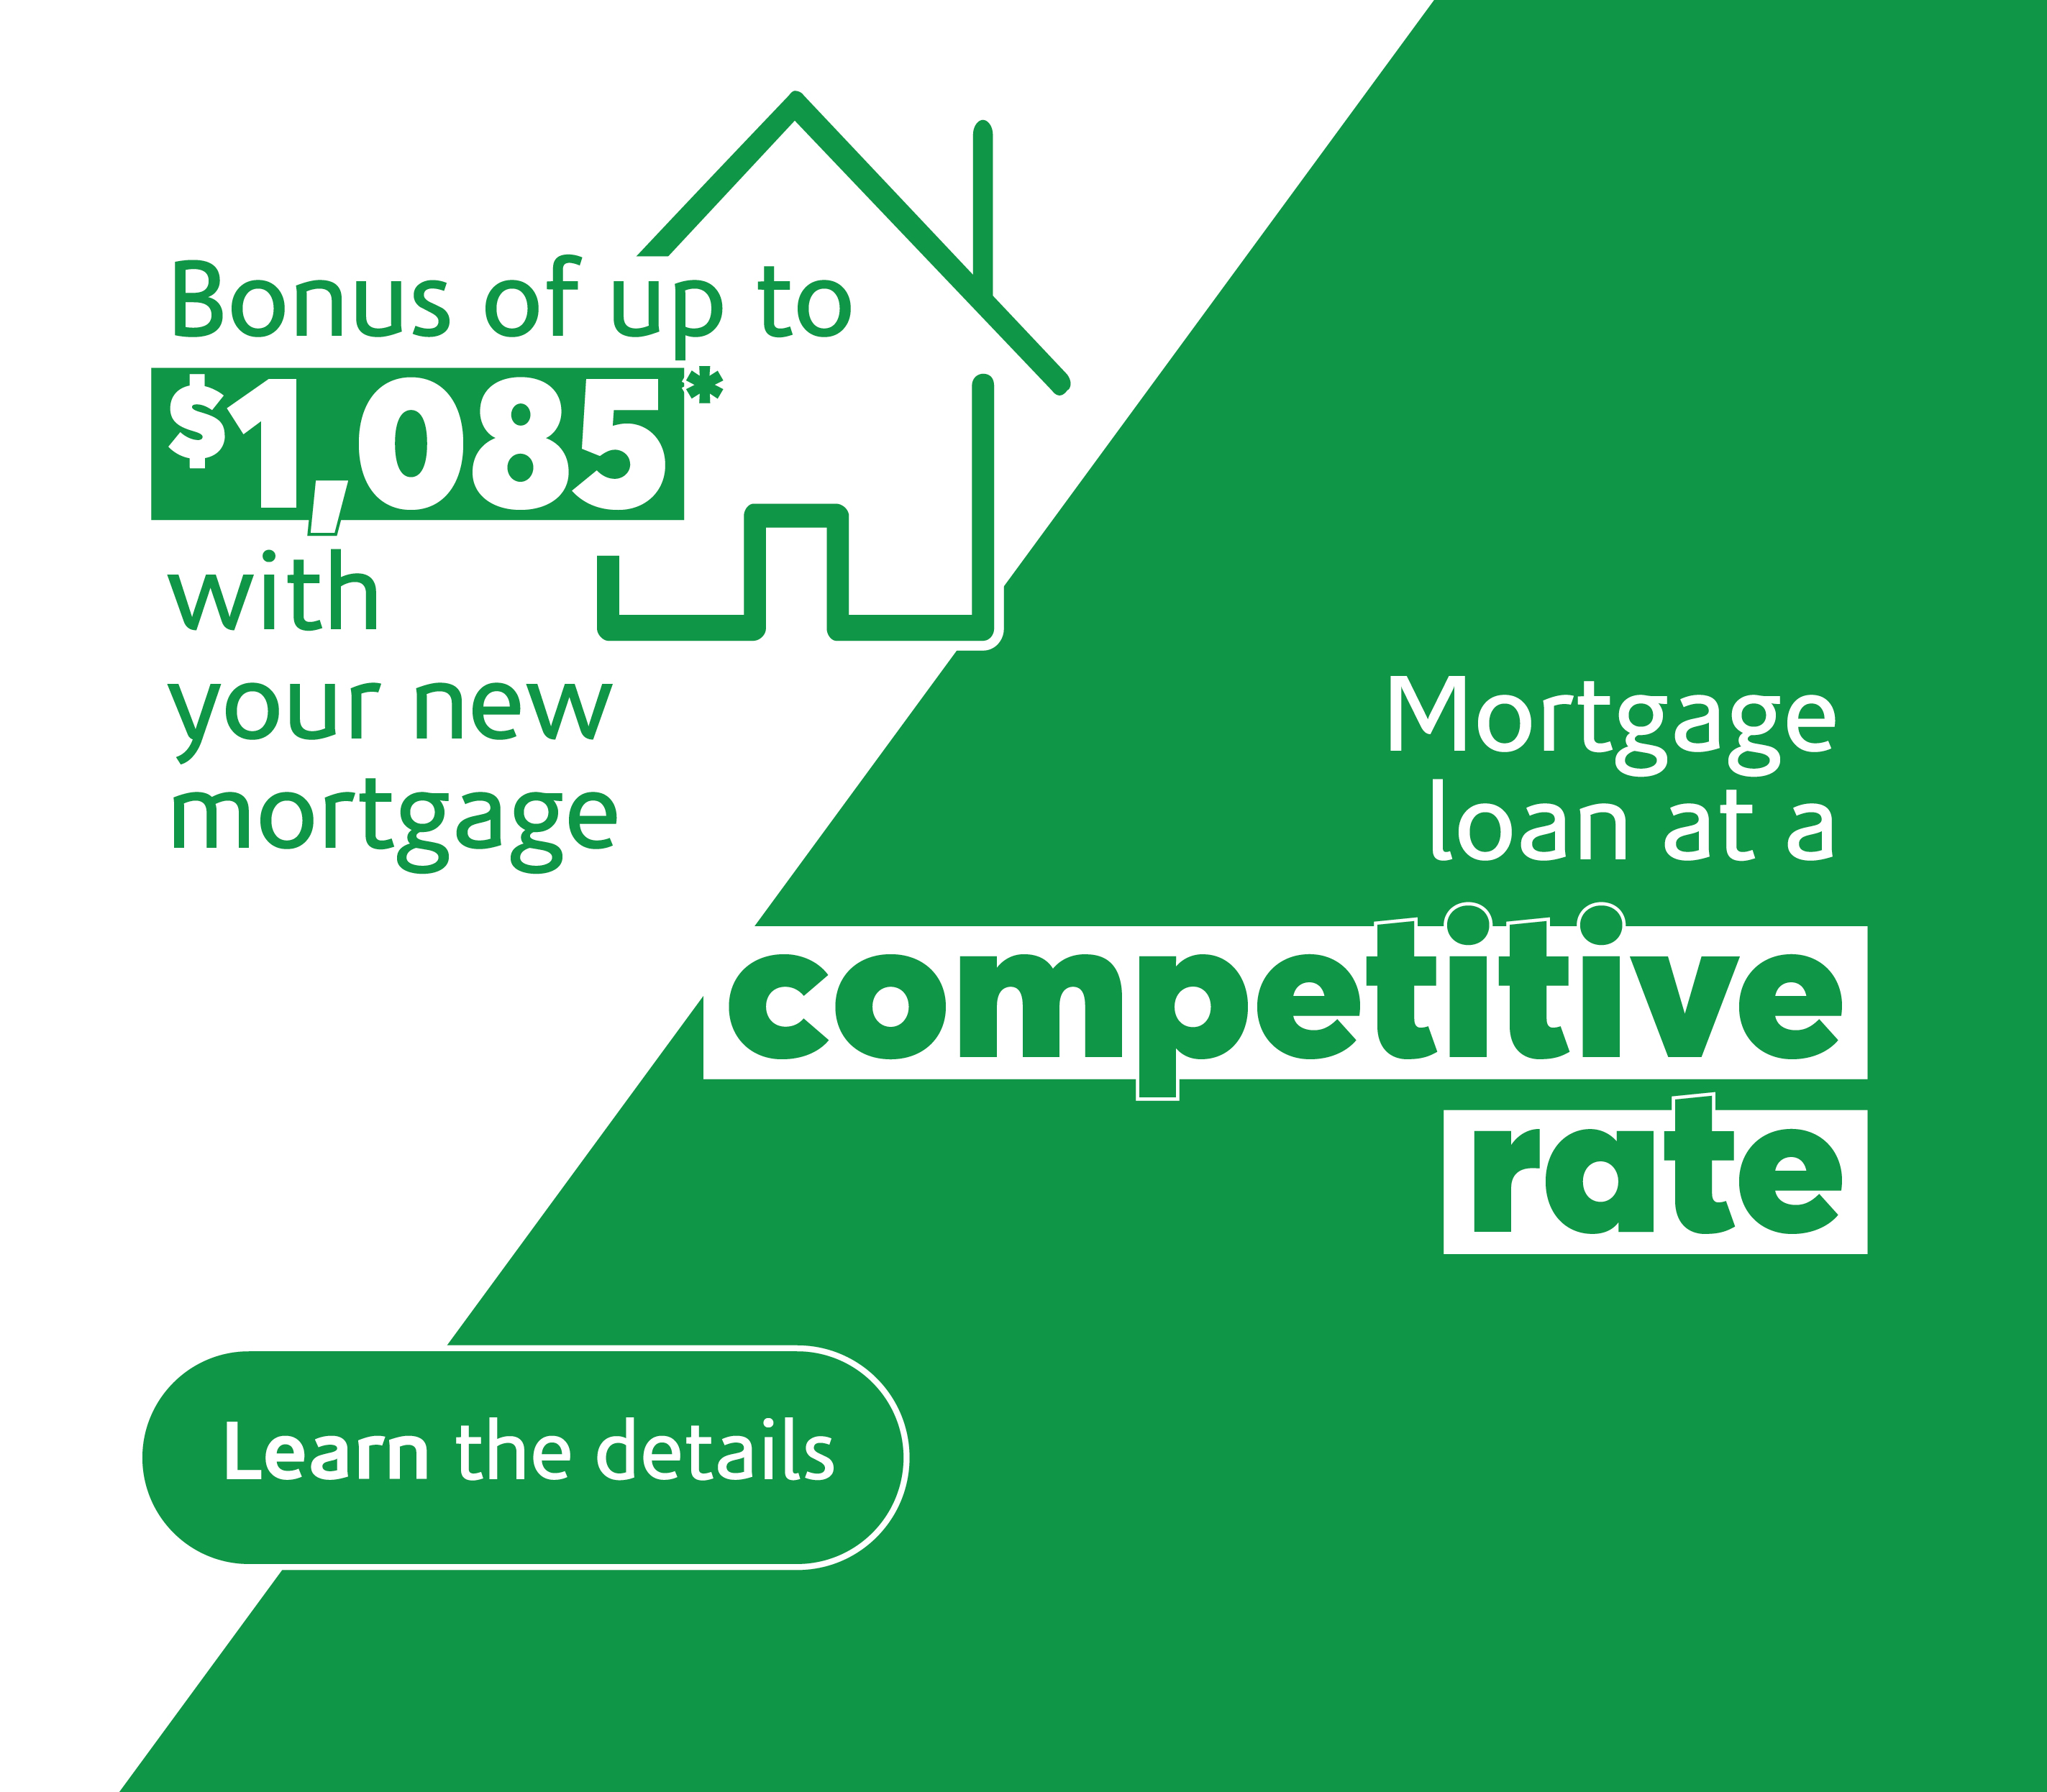 Mortgage bonus